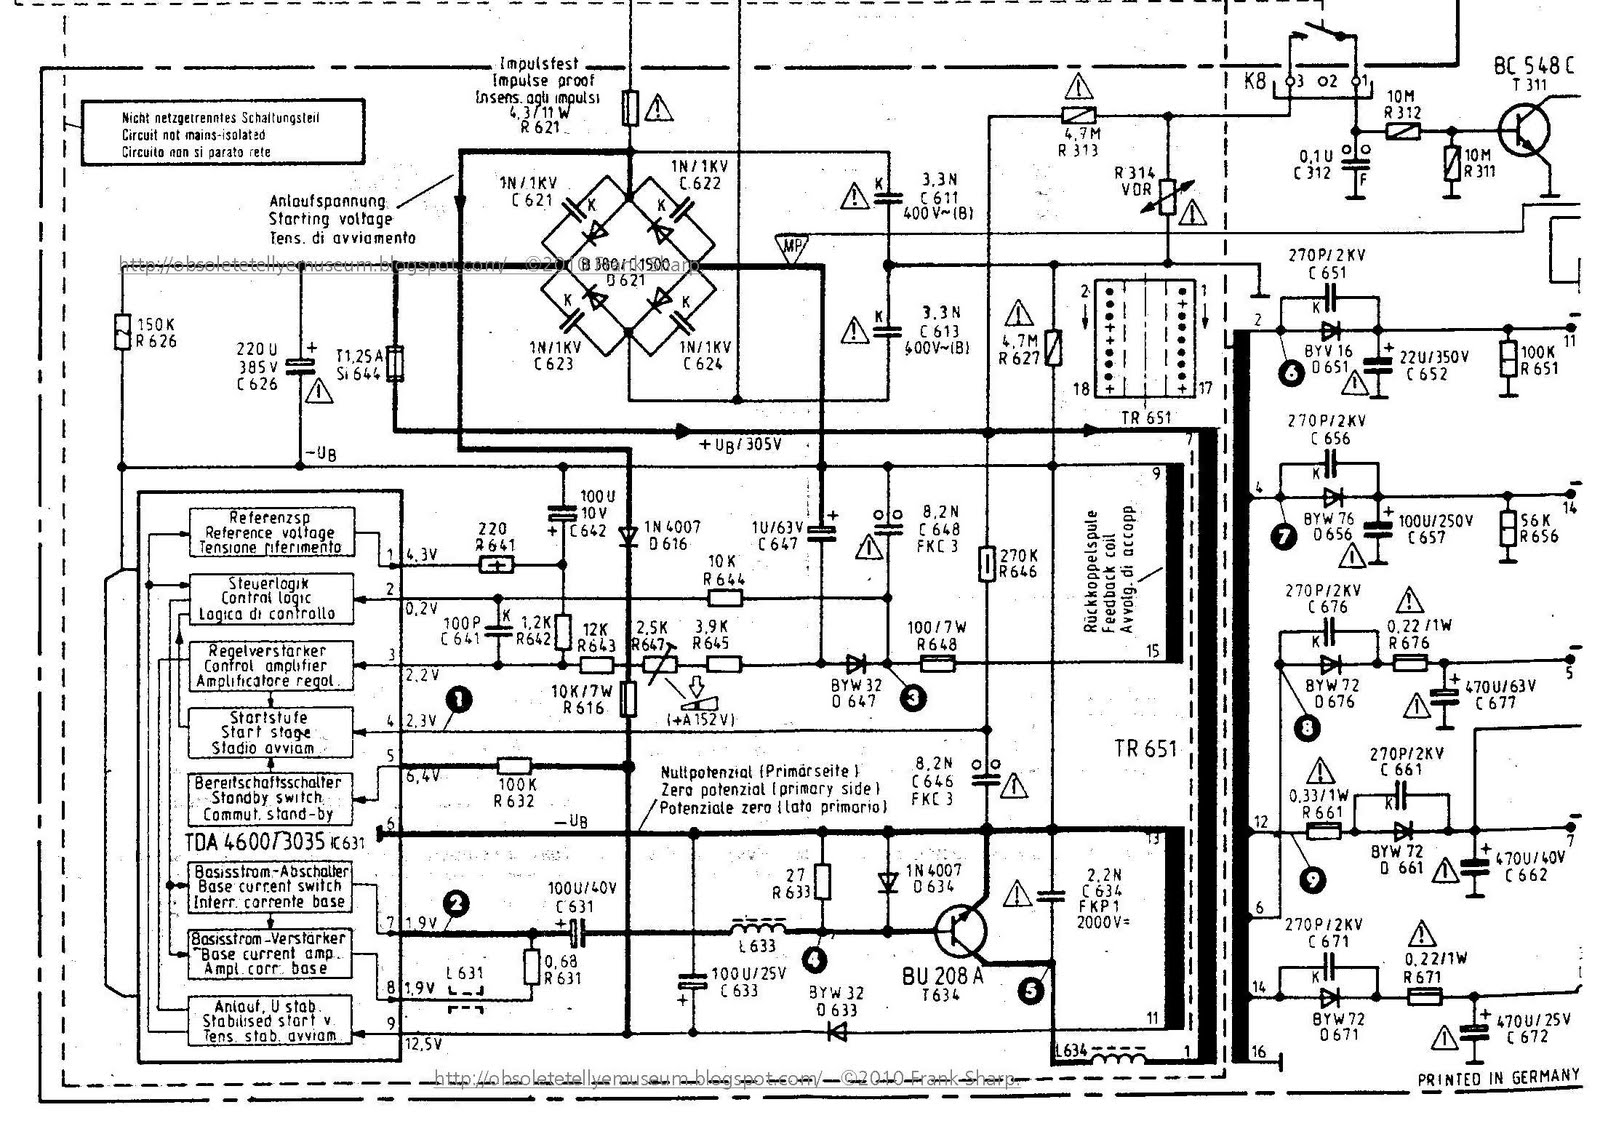 ifb washing machine motor wiring diagram wiring library rh 4 evitta de whirlpool washing machine model numbers whirlpool washing machine wiring diagram [ 1600 x 1126 Pixel ]